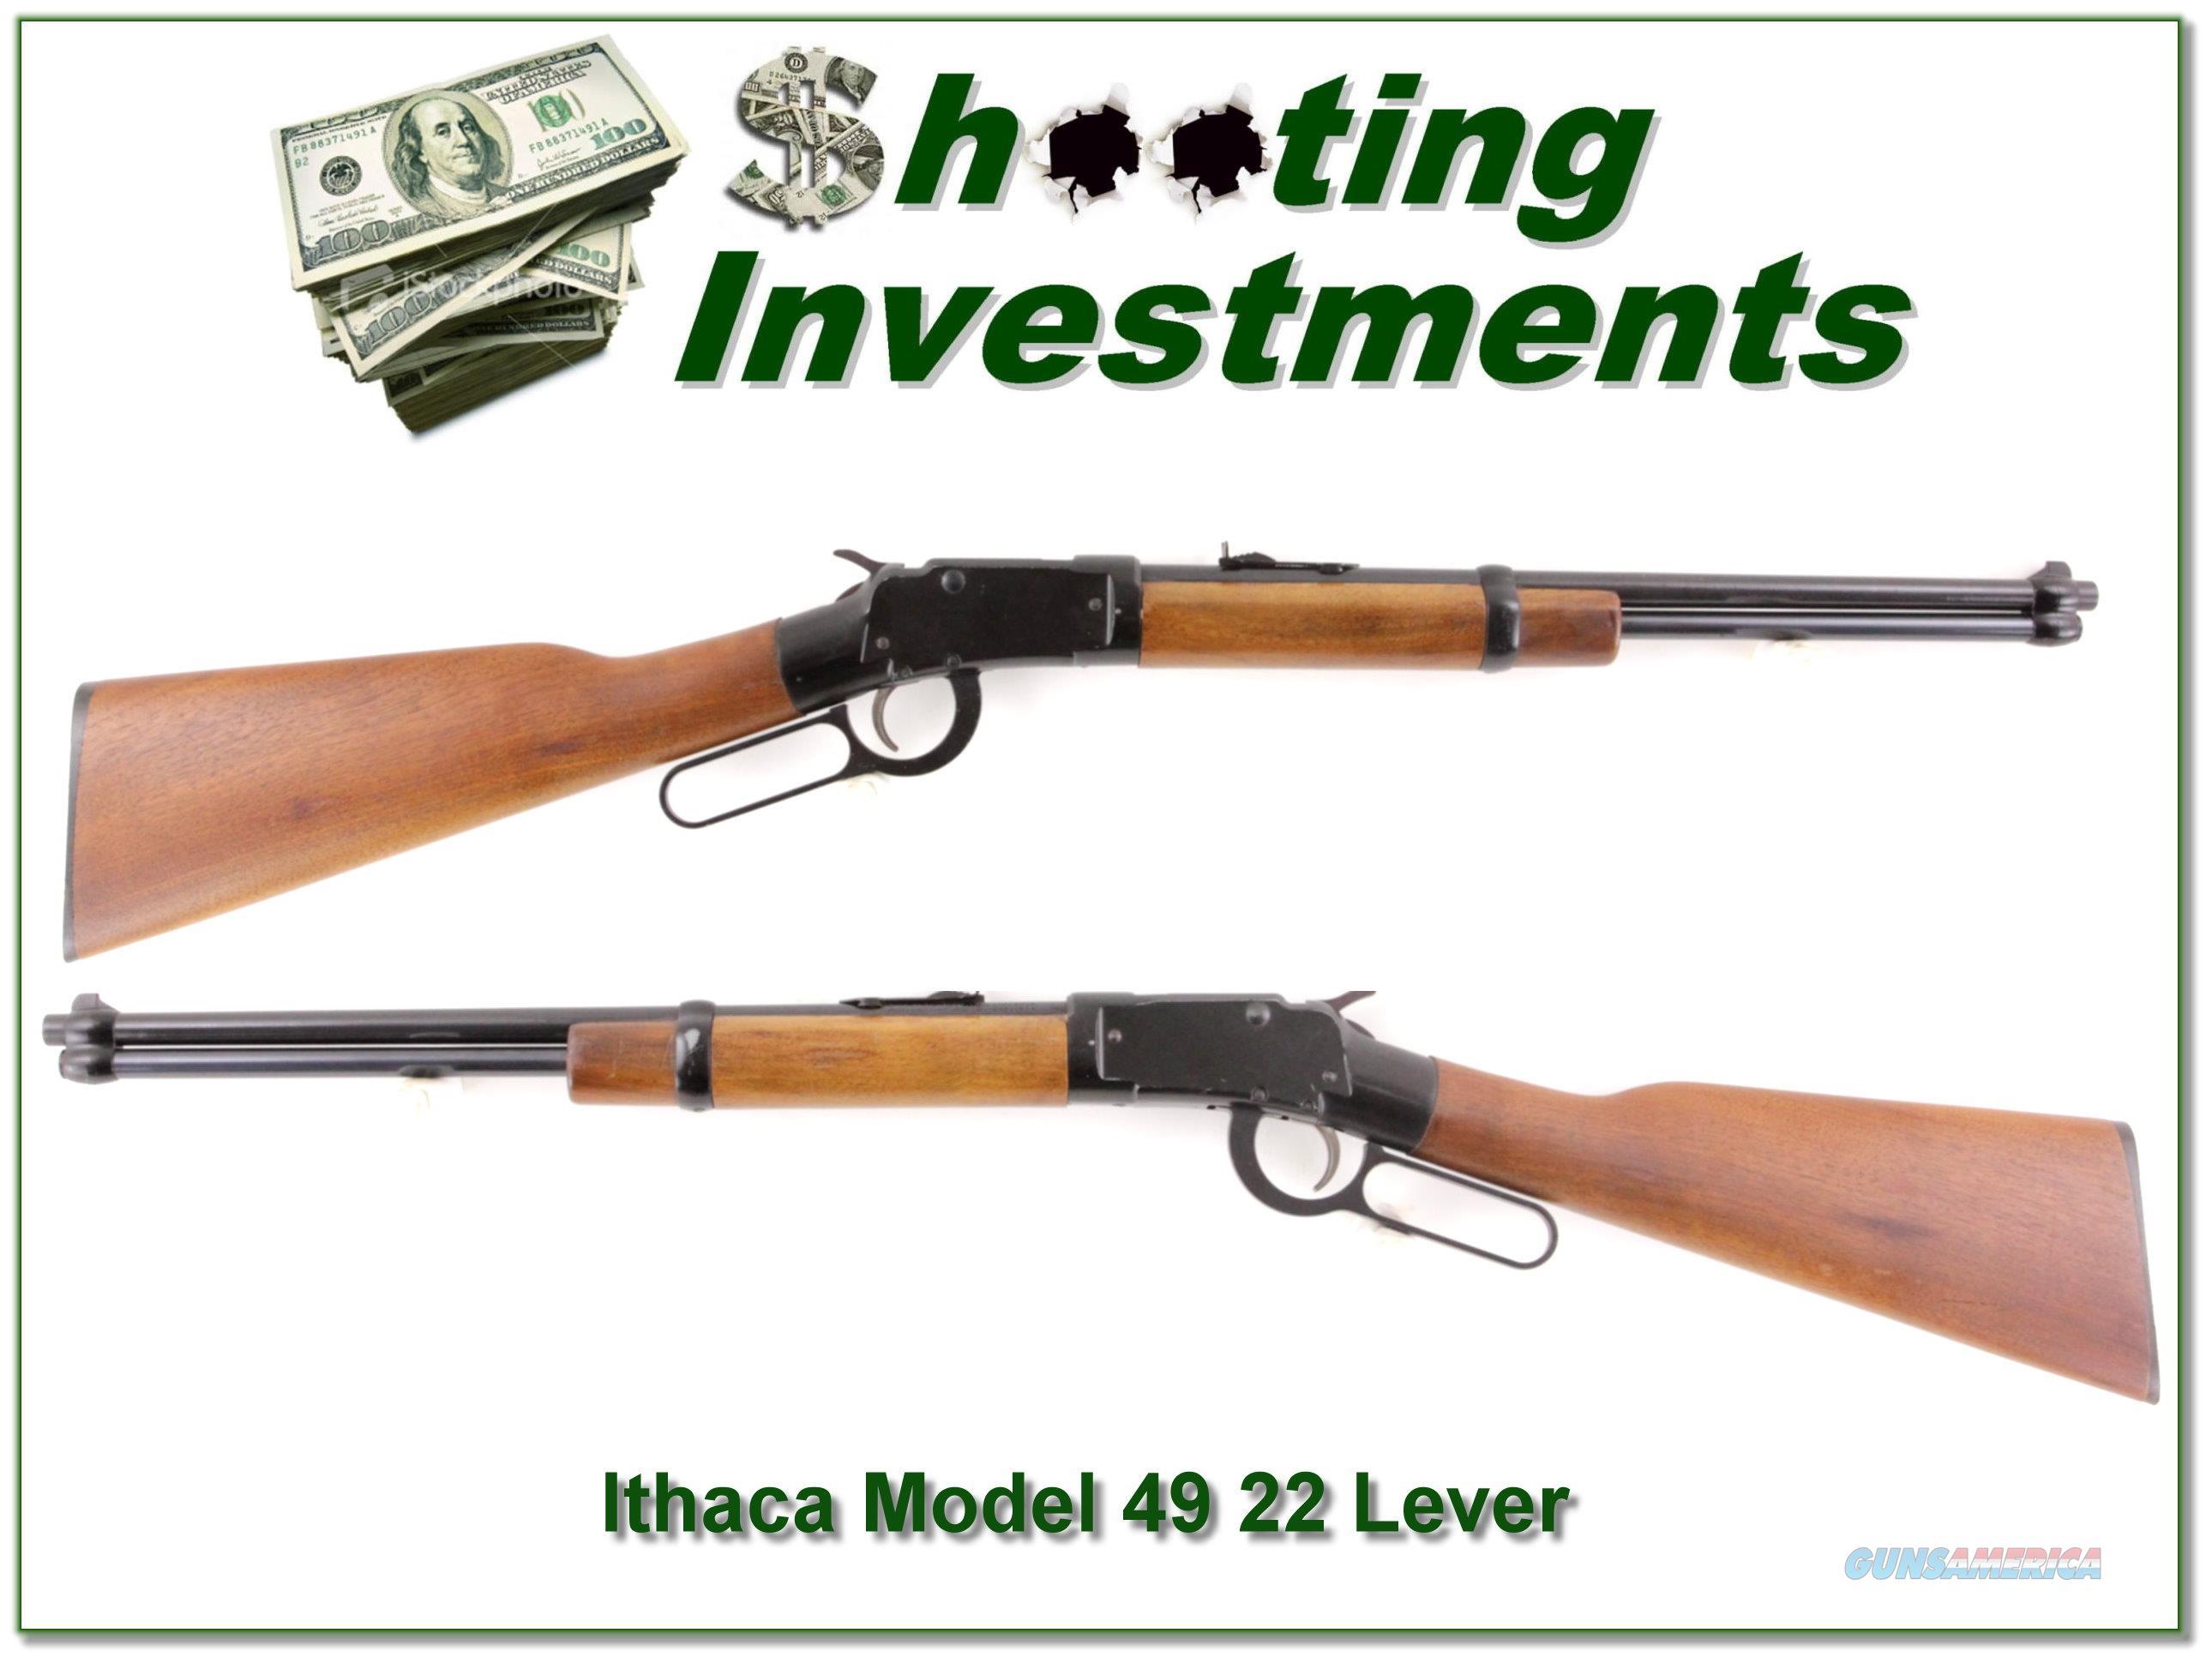 Ithaca Model 49 Lever Action single shot 22LR  Guns > Rifles > Ithaca Rifles